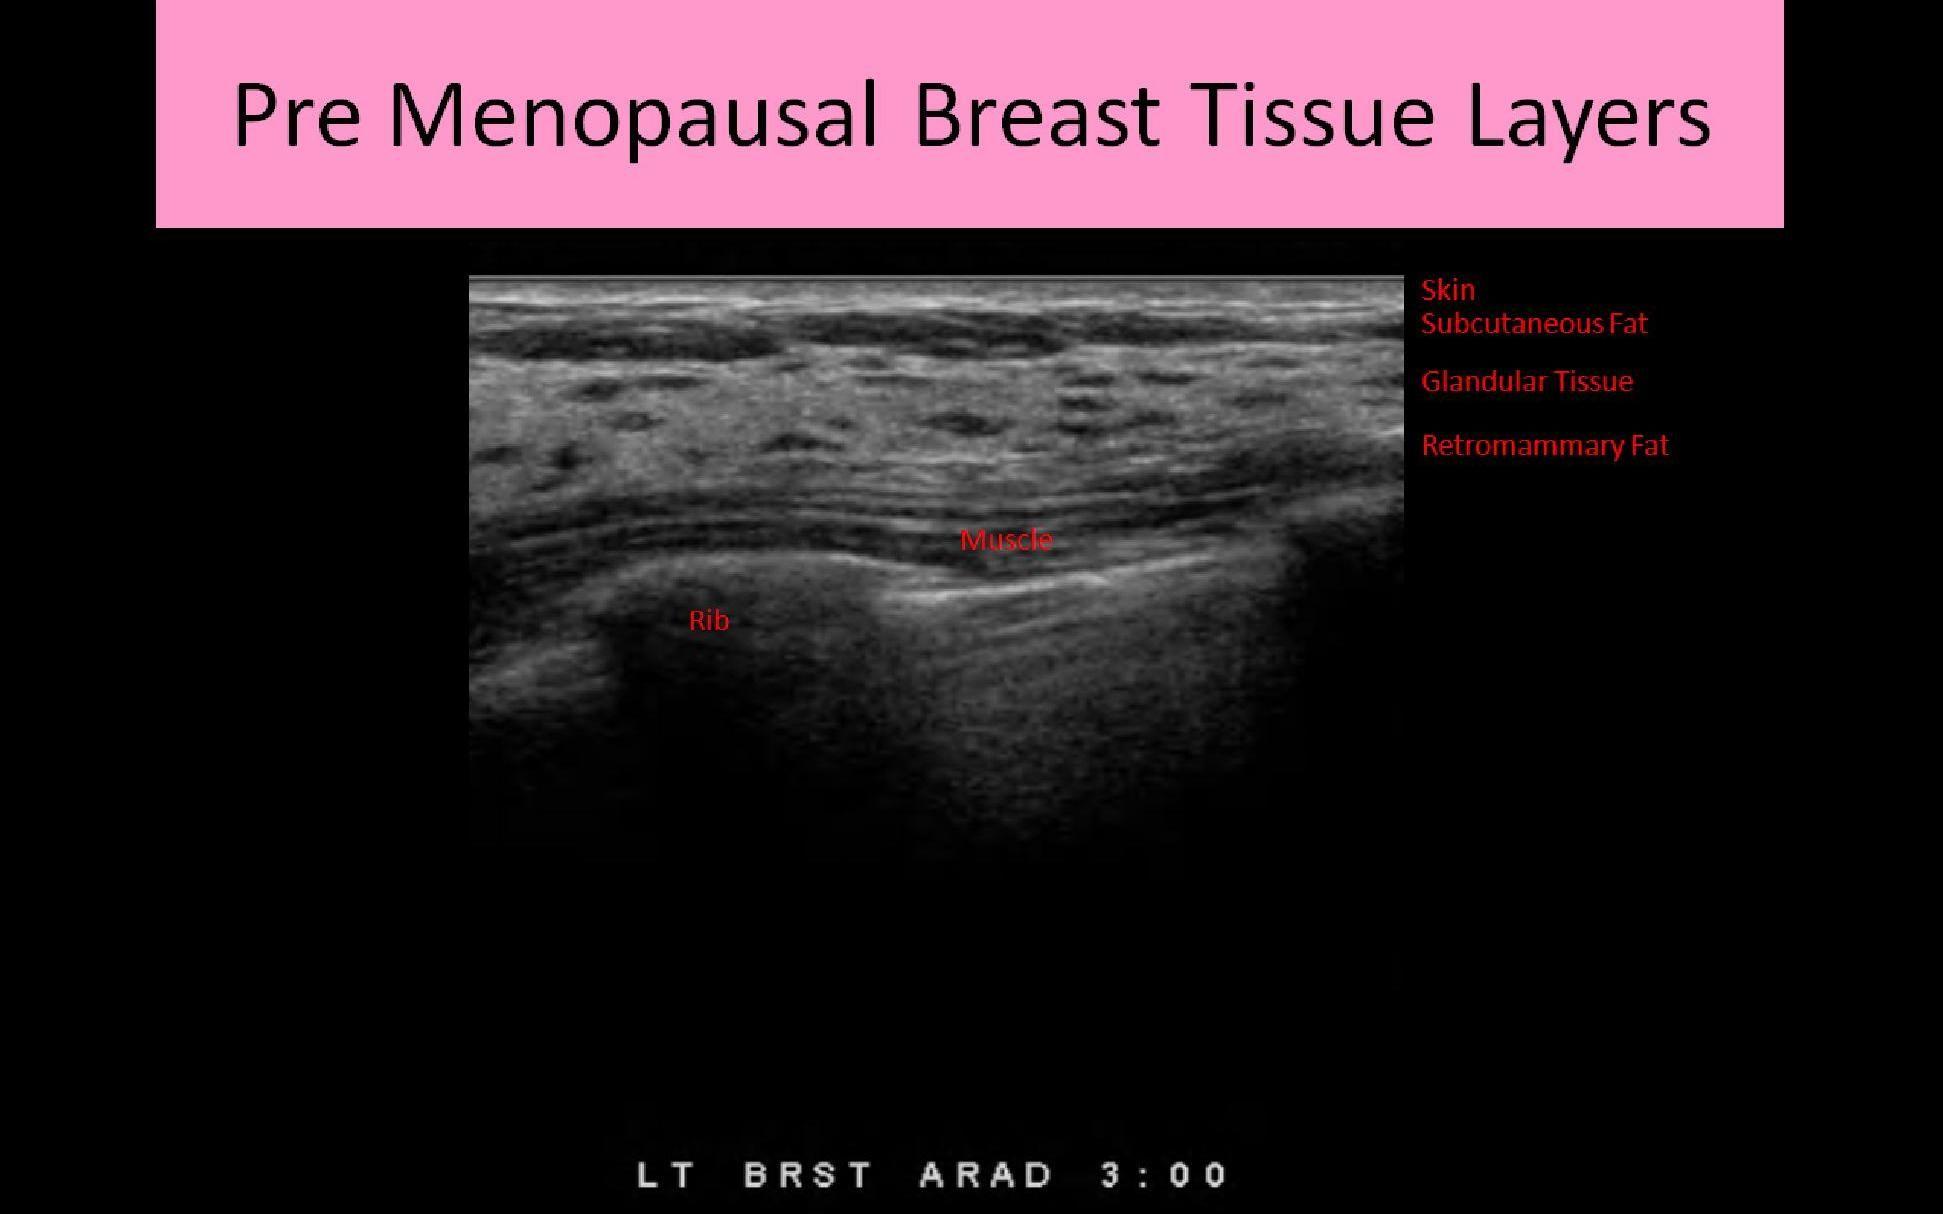 Breast ultrasound cme online